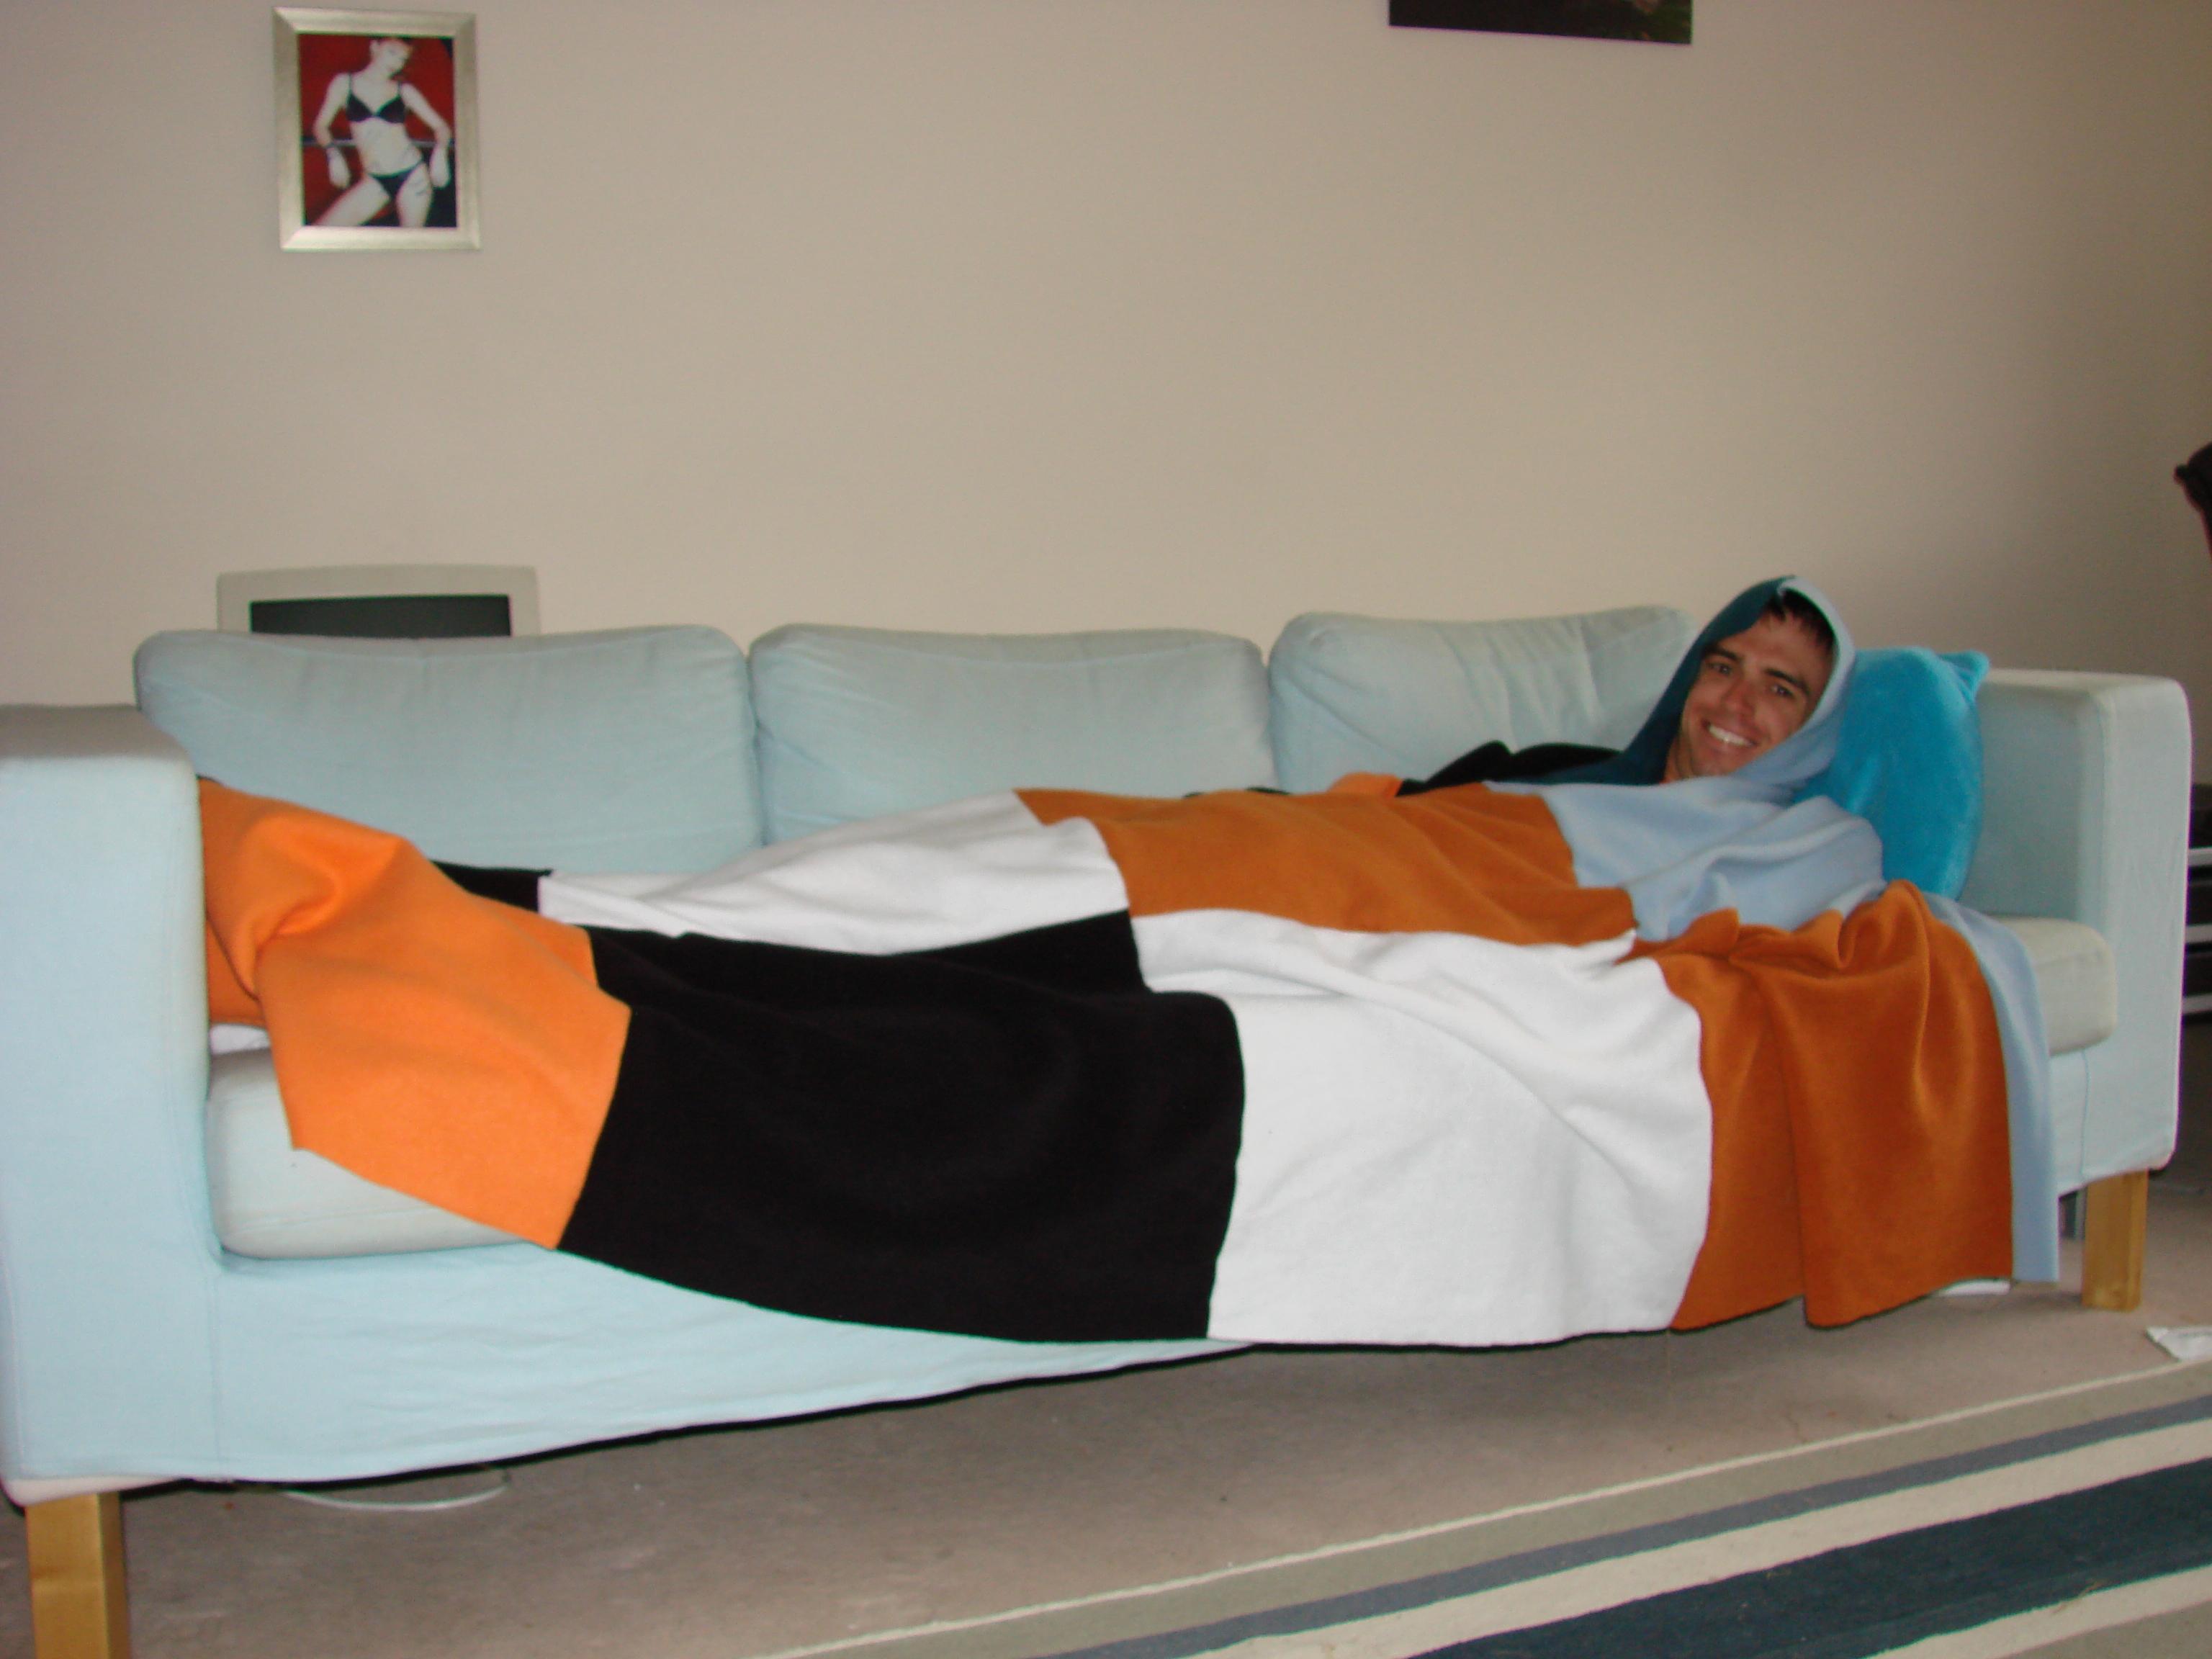 Blanket With Built-In Hood